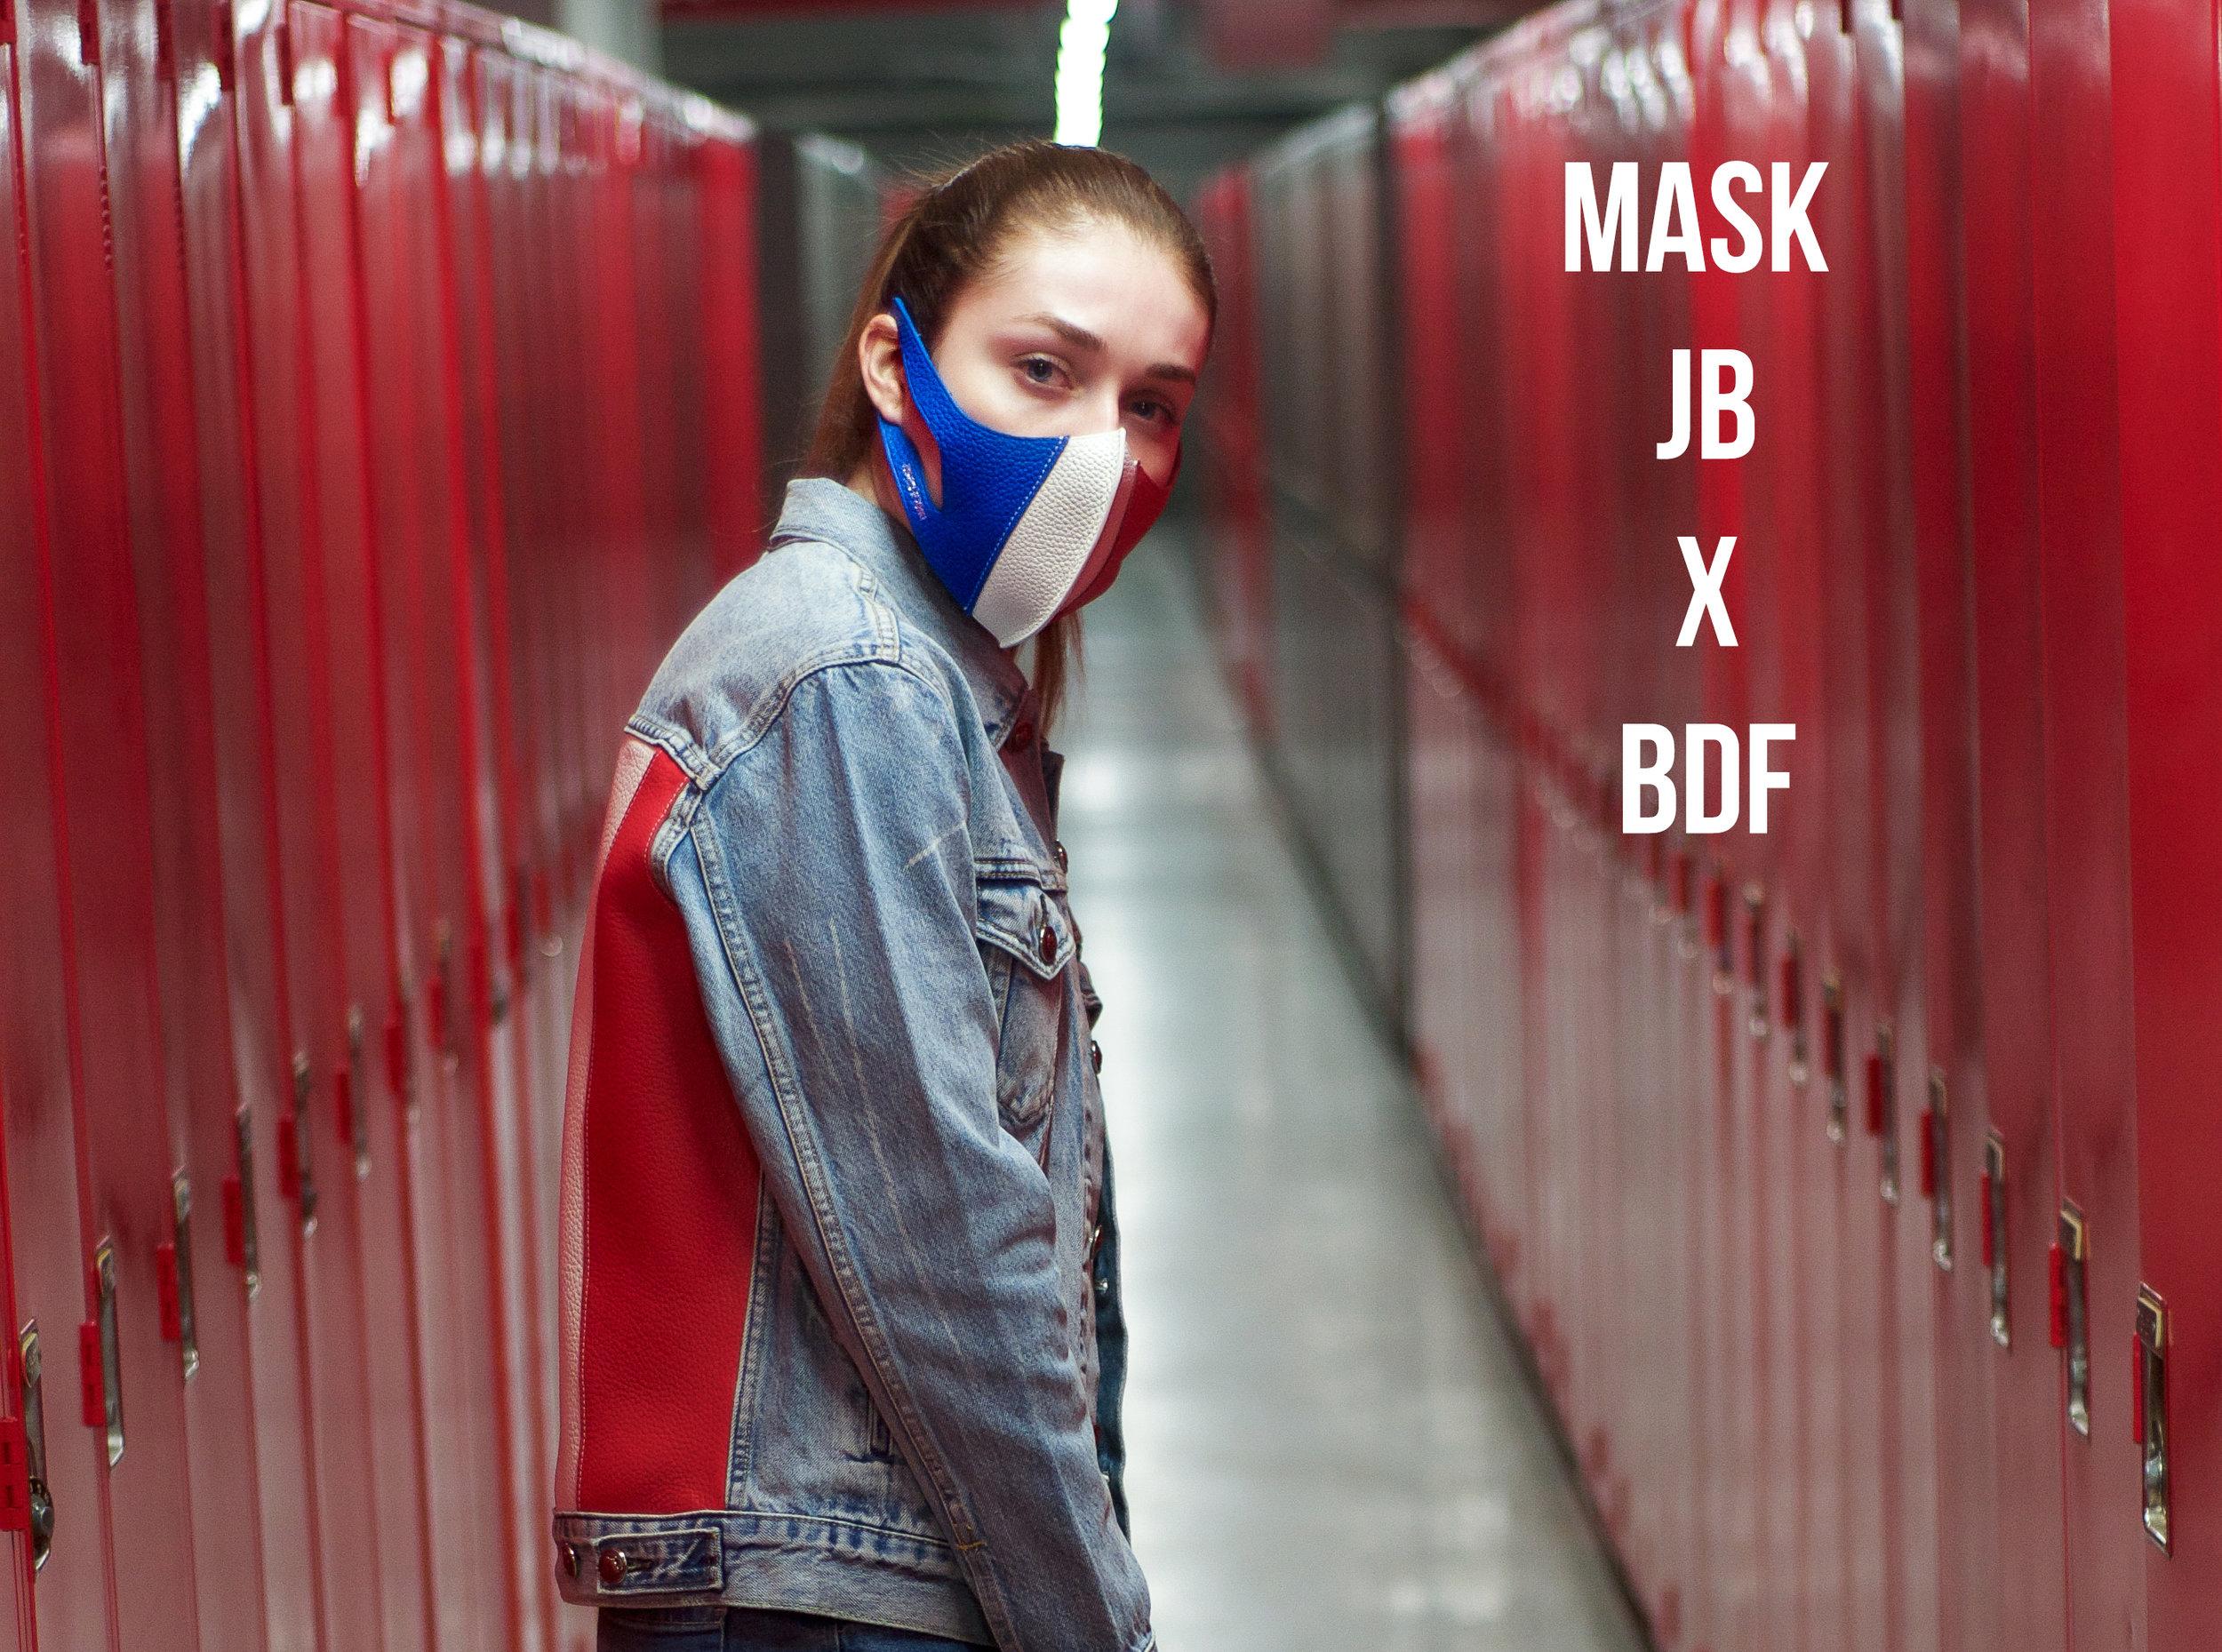 Jerome Bocchio mask x bourgeois de france.jpg